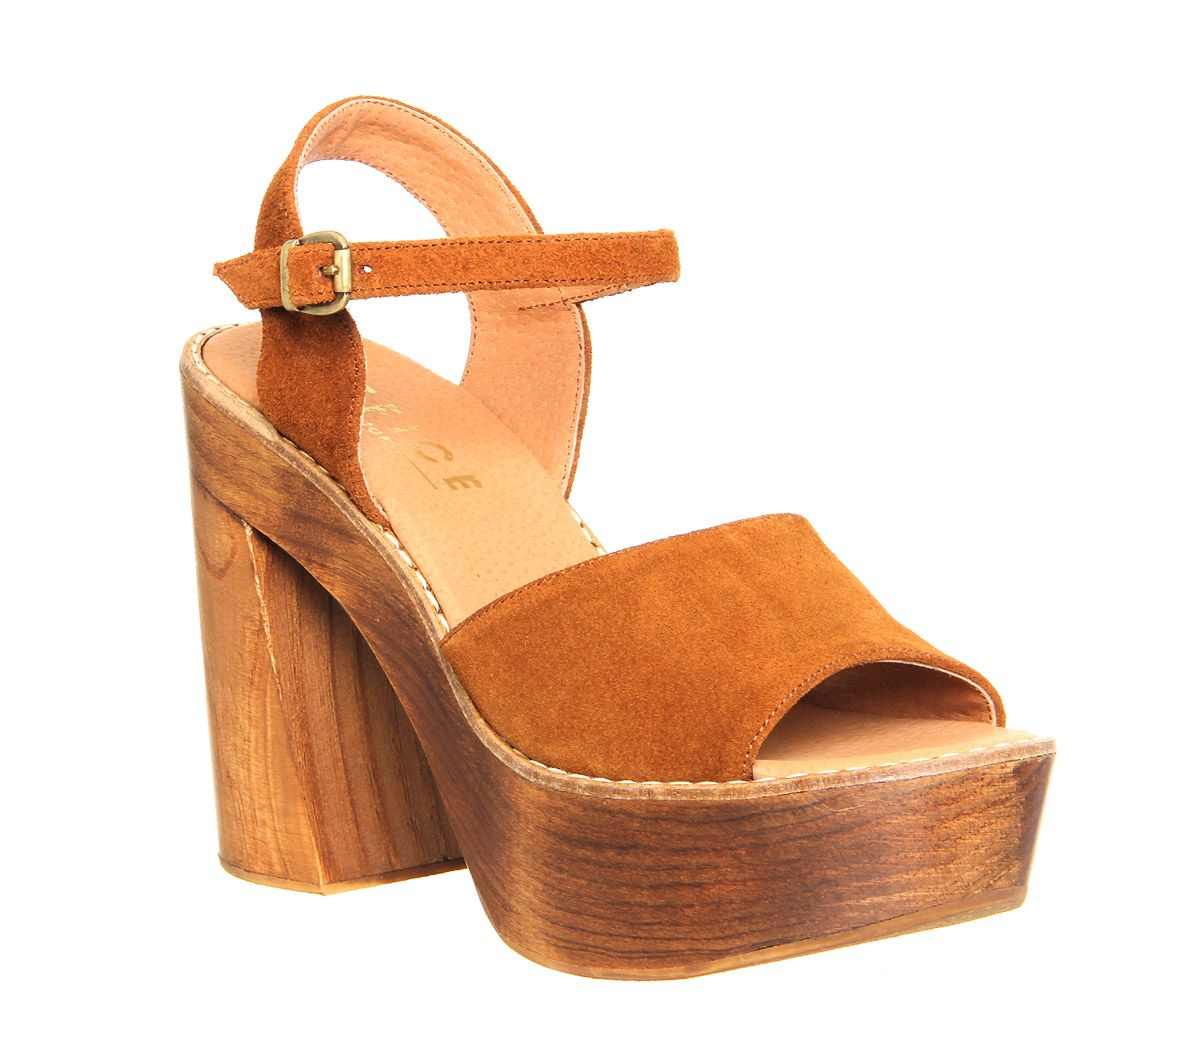 4d684163877e Buy Tan Suede Office Porter Chunky Heel Sandal from OFFICE.co.uk ...